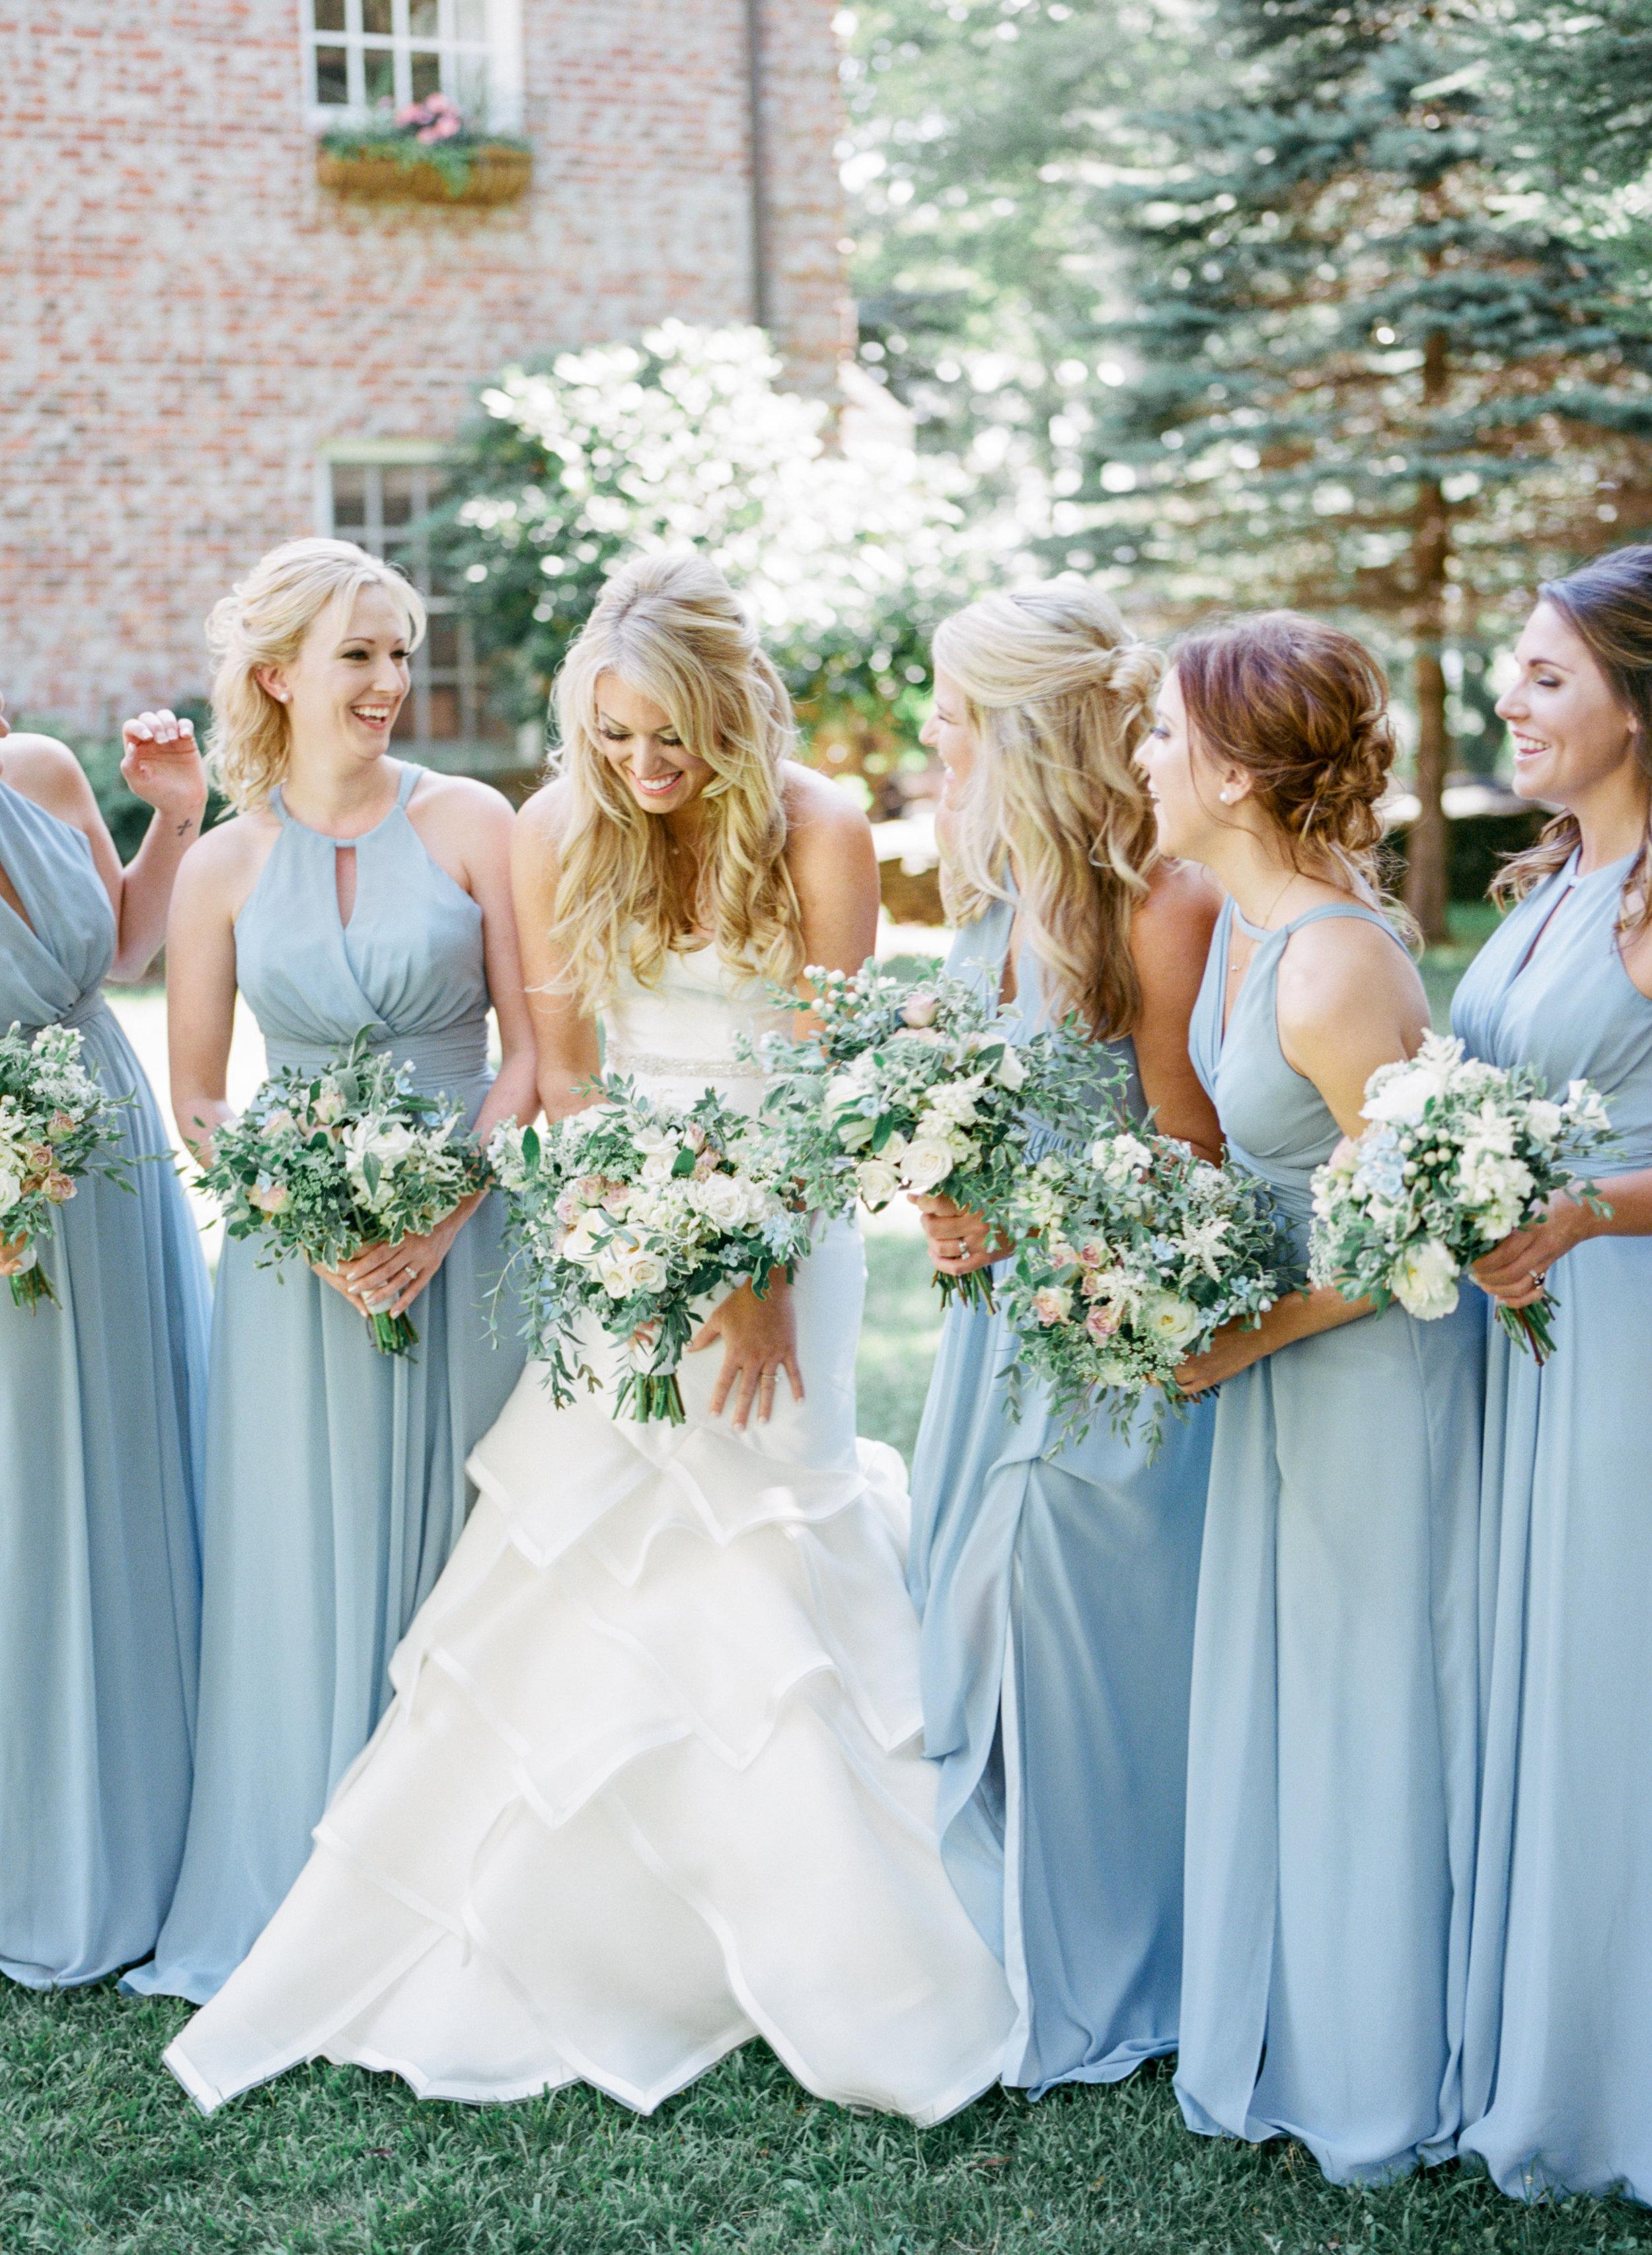 Kristen-Michael-Wedding-WeddingParty-022.jpg